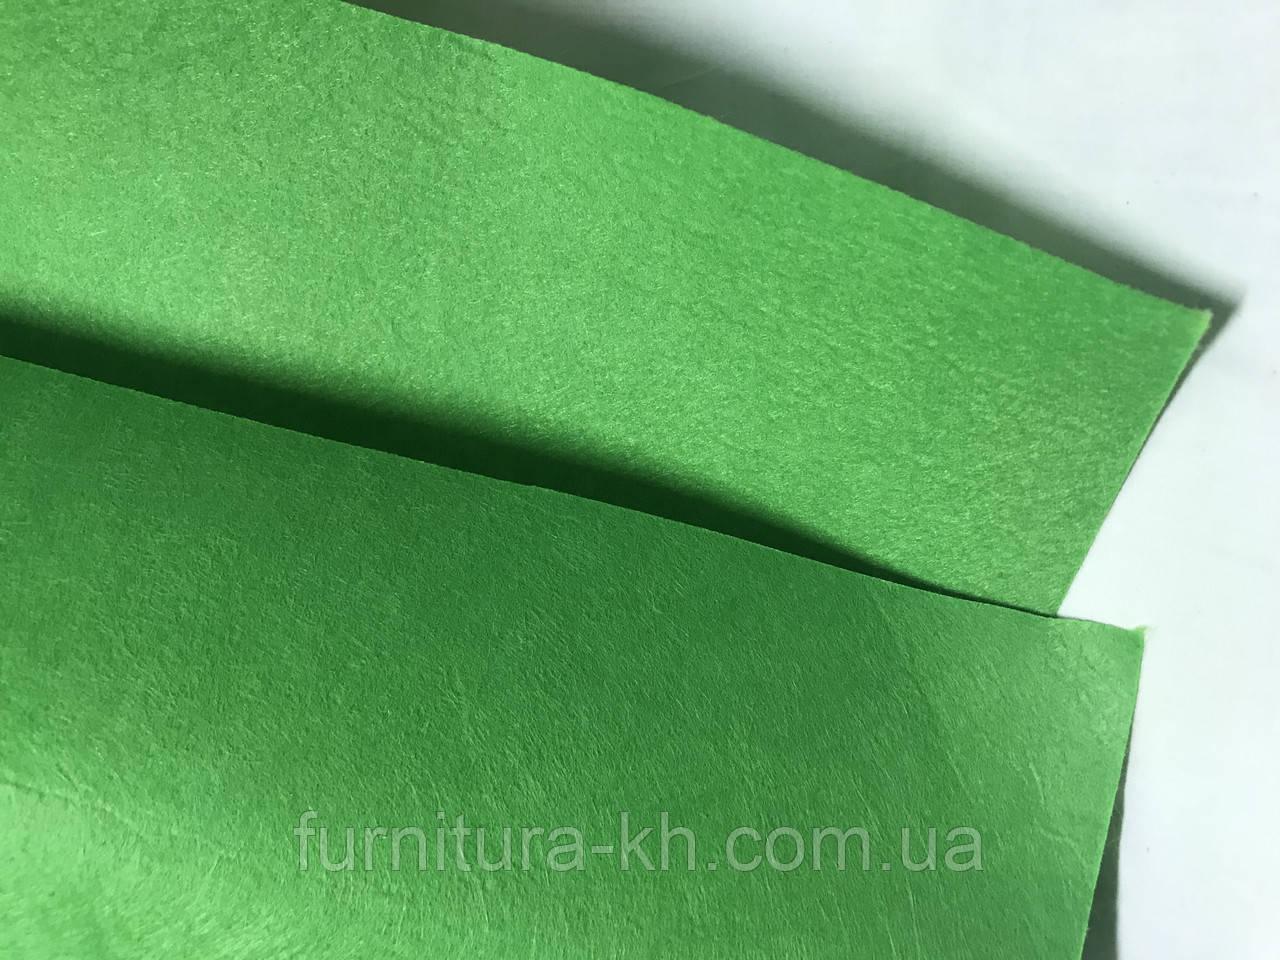 Фетр зеленый размер 50 Х 40 см, толщина 2 мм